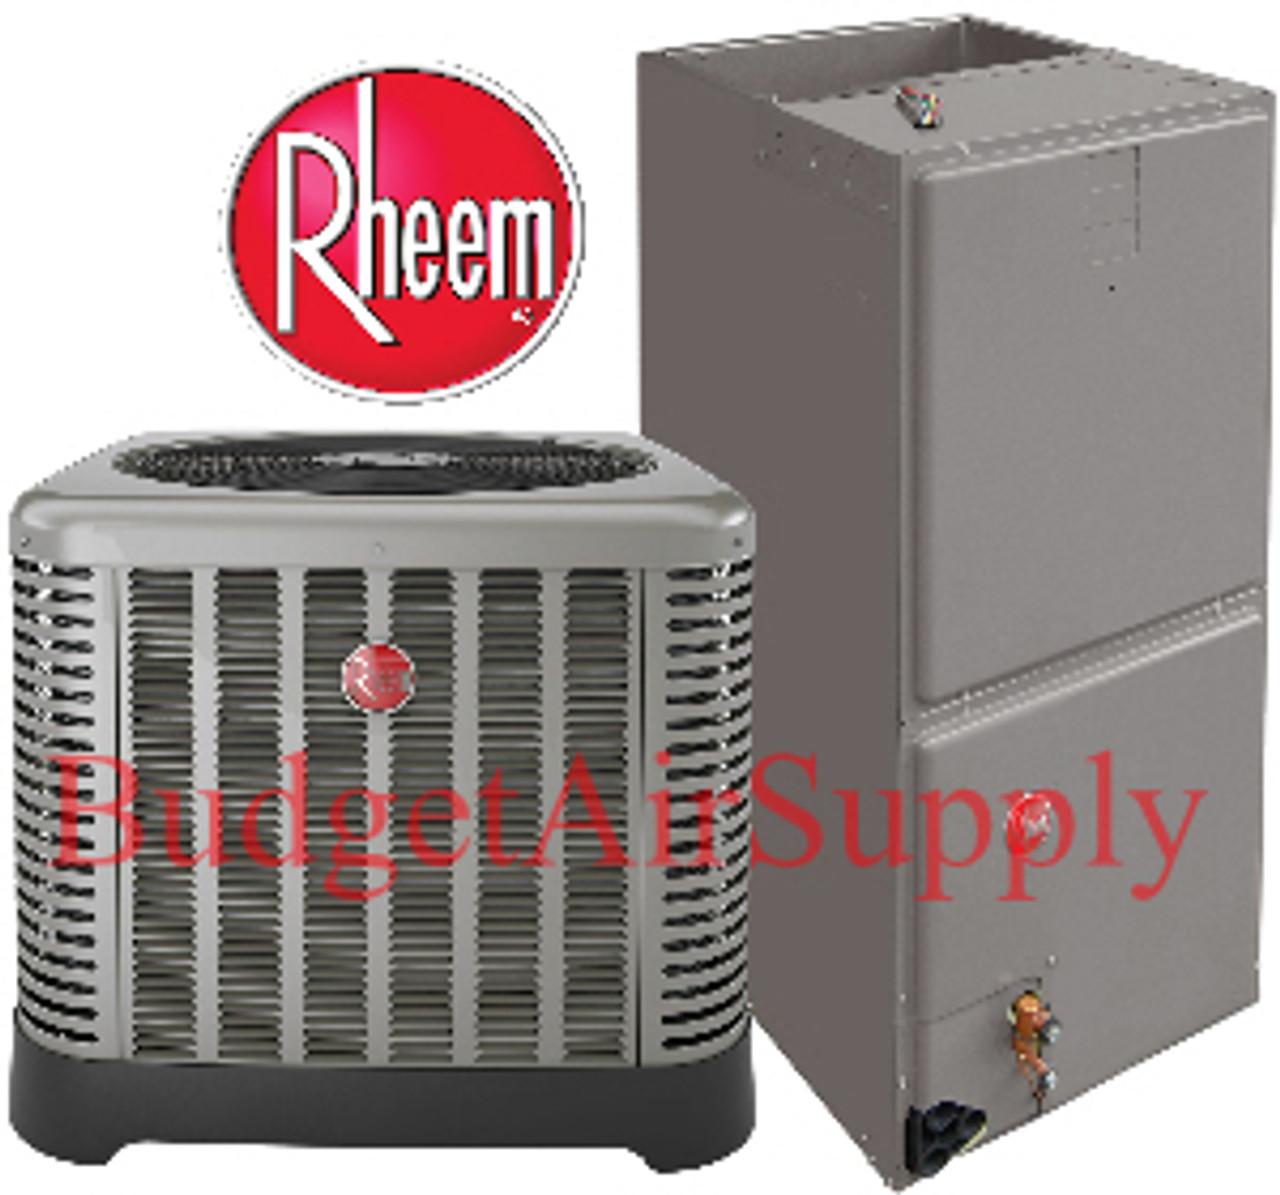 Rheem Ruud 4 Ton 16 Seer Air Conditioning System Ra1648aj1 Rh1t4821stanja